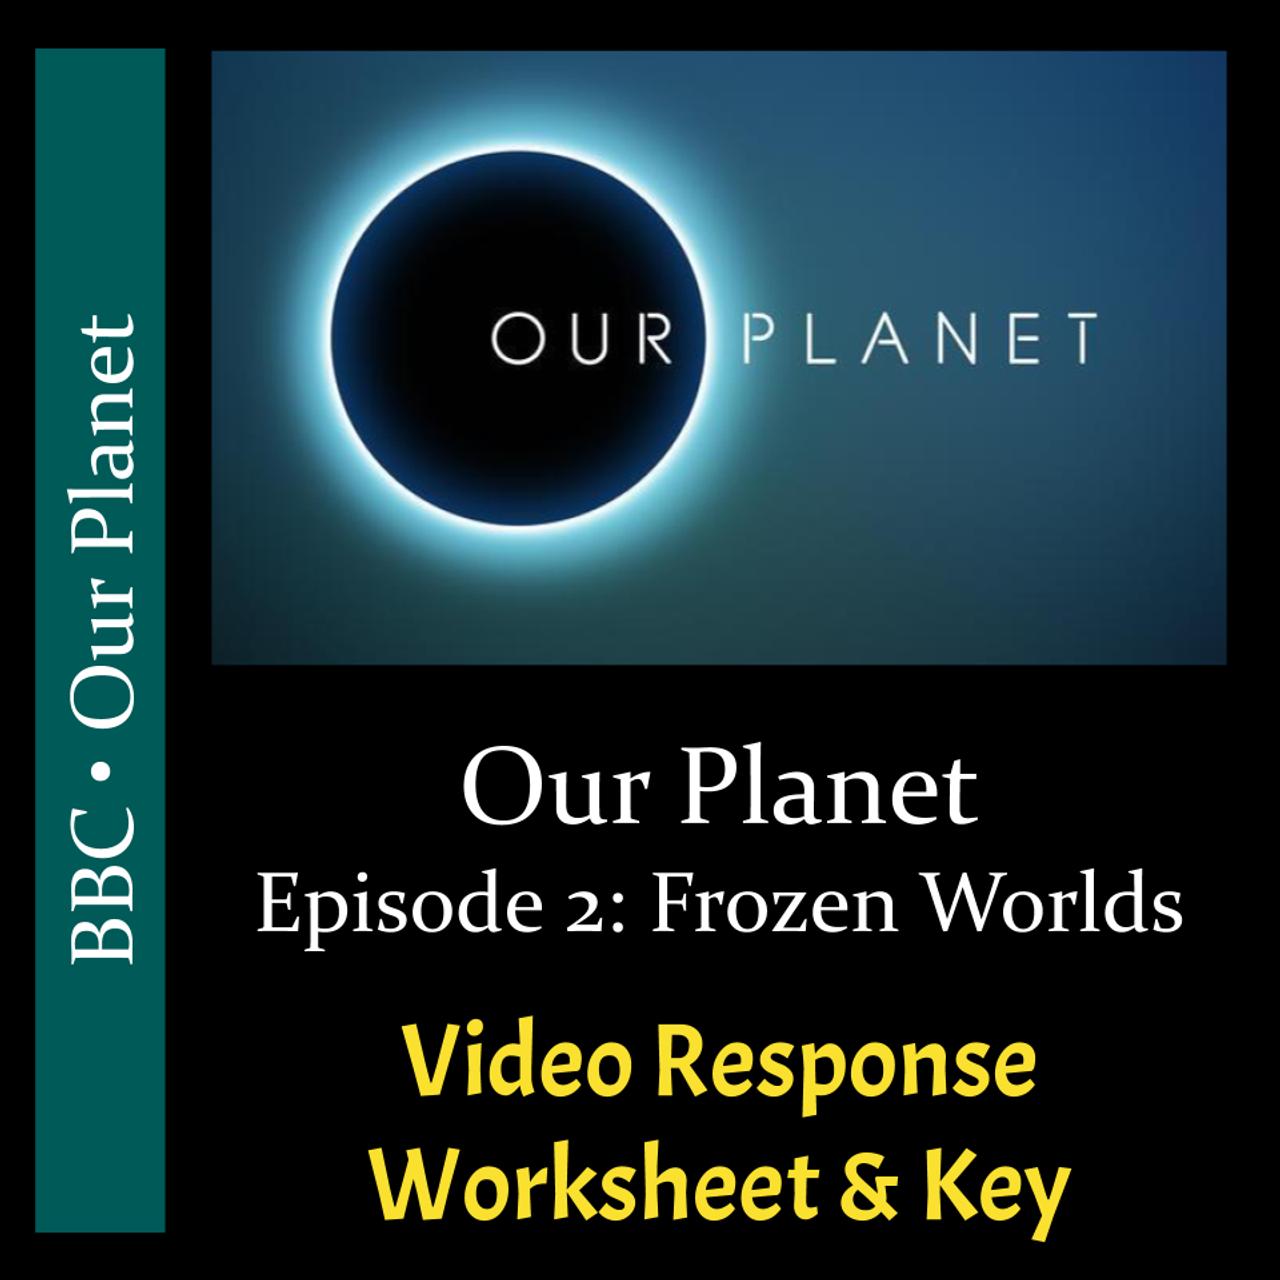 Our Planet - Episode 2: Frozen Worlds - Video Response Worksheet & Key